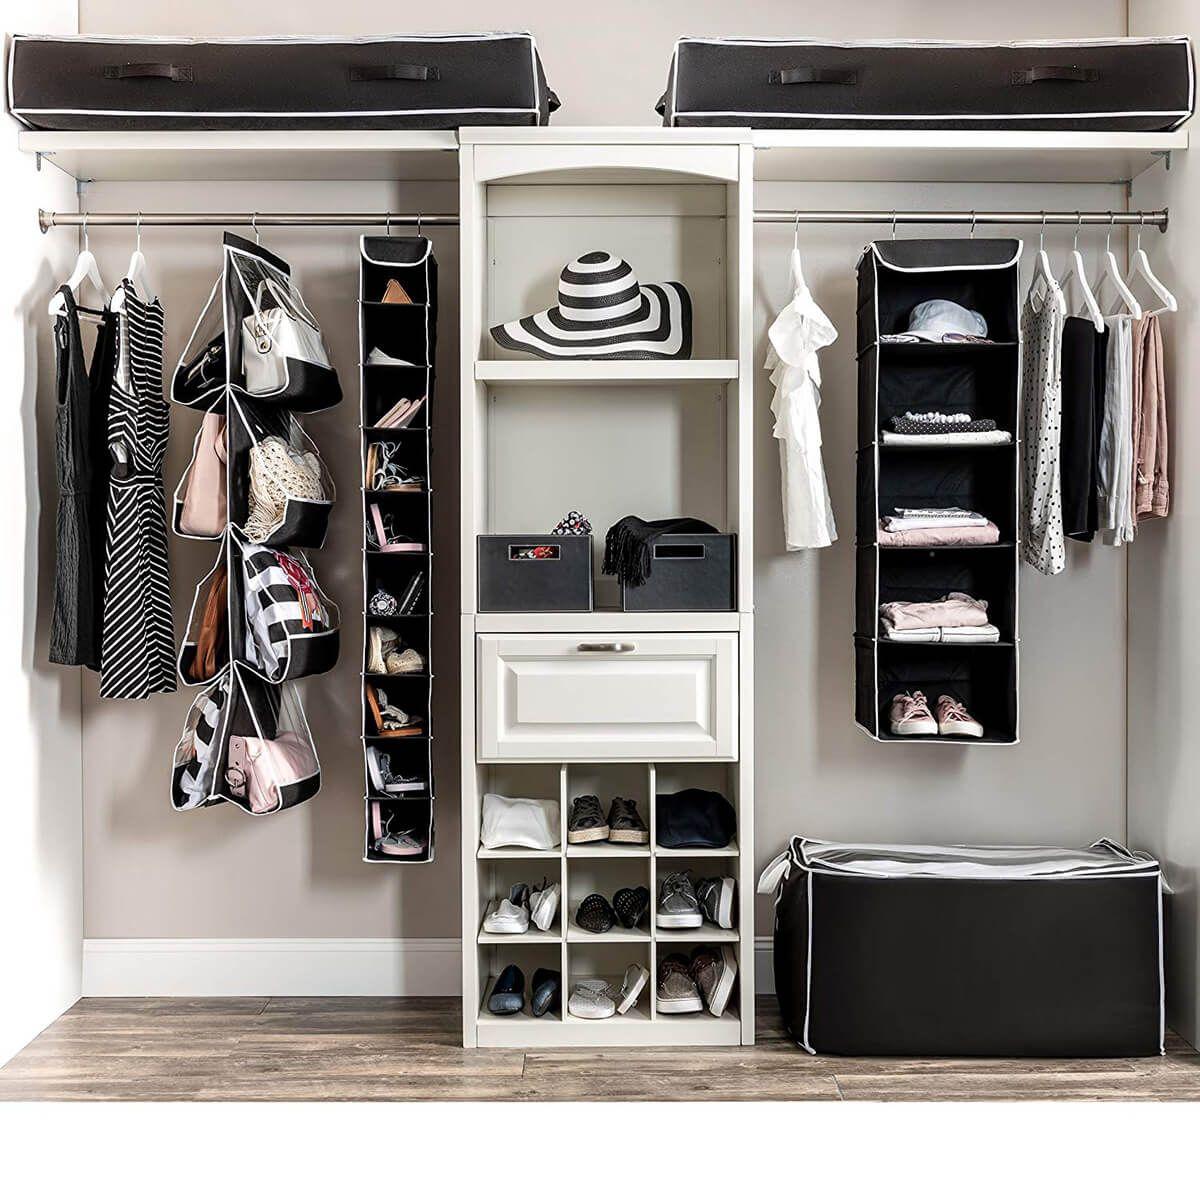 Fabulous Complete Black And White Closet Organizers Closet Organization Closet Shelf Organization Hanging Closet Organizer